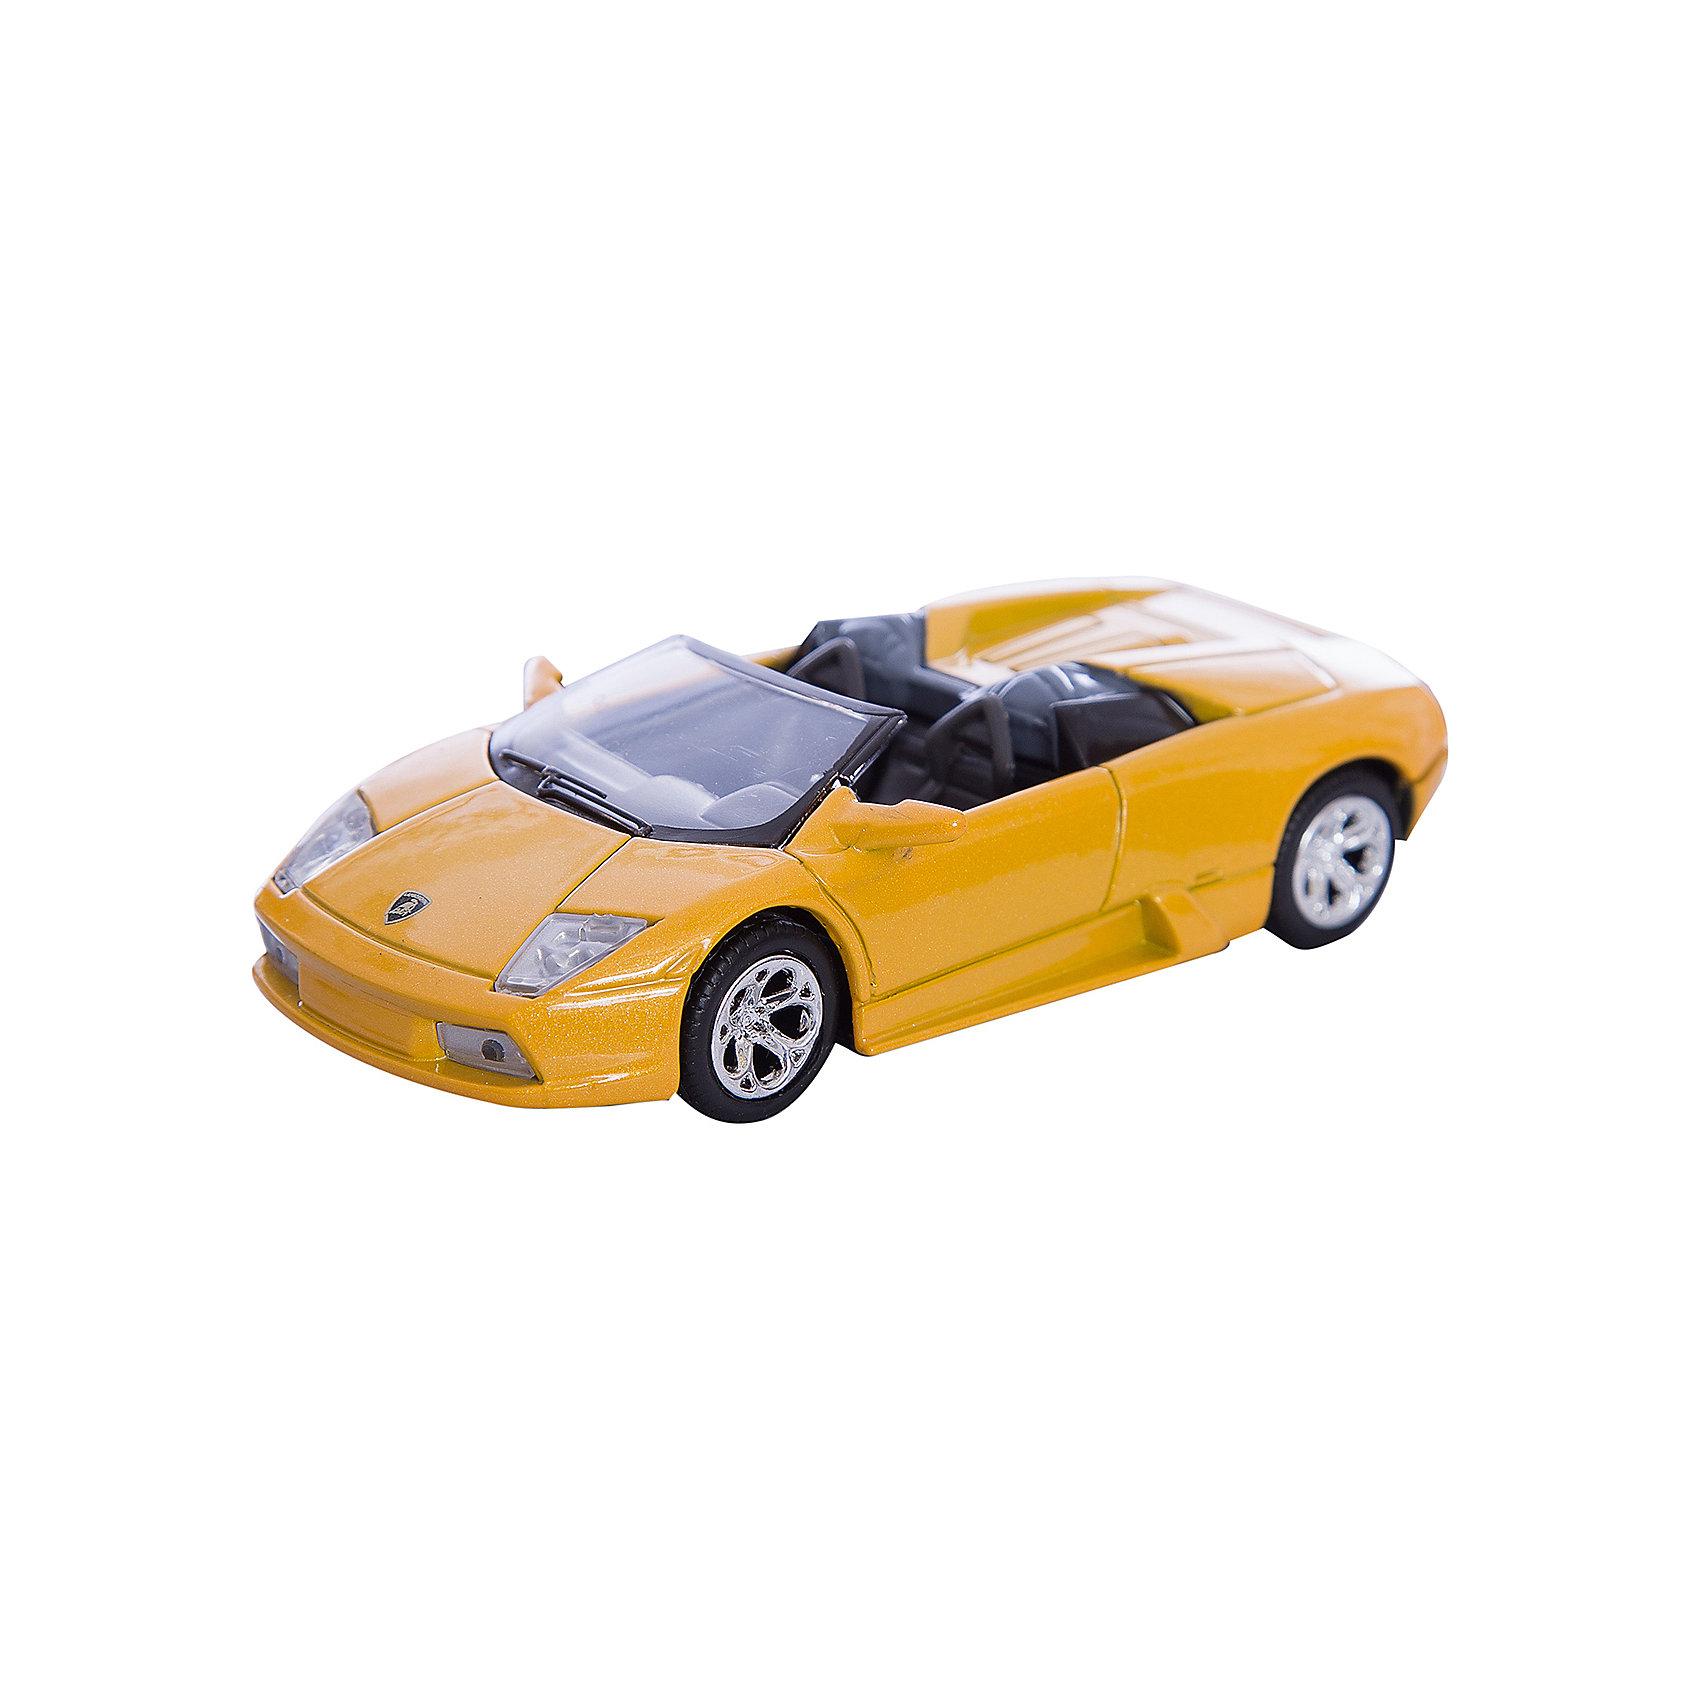 Машинка Lamborghini Murcielago Roadster 1:43, AutotimeМашинки<br><br><br>Ширина мм: 165<br>Глубина мм: 57<br>Высота мм: 75<br>Вес г: 13<br>Возраст от месяцев: 36<br>Возраст до месяцев: 2147483647<br>Пол: Мужской<br>Возраст: Детский<br>SKU: 5584100